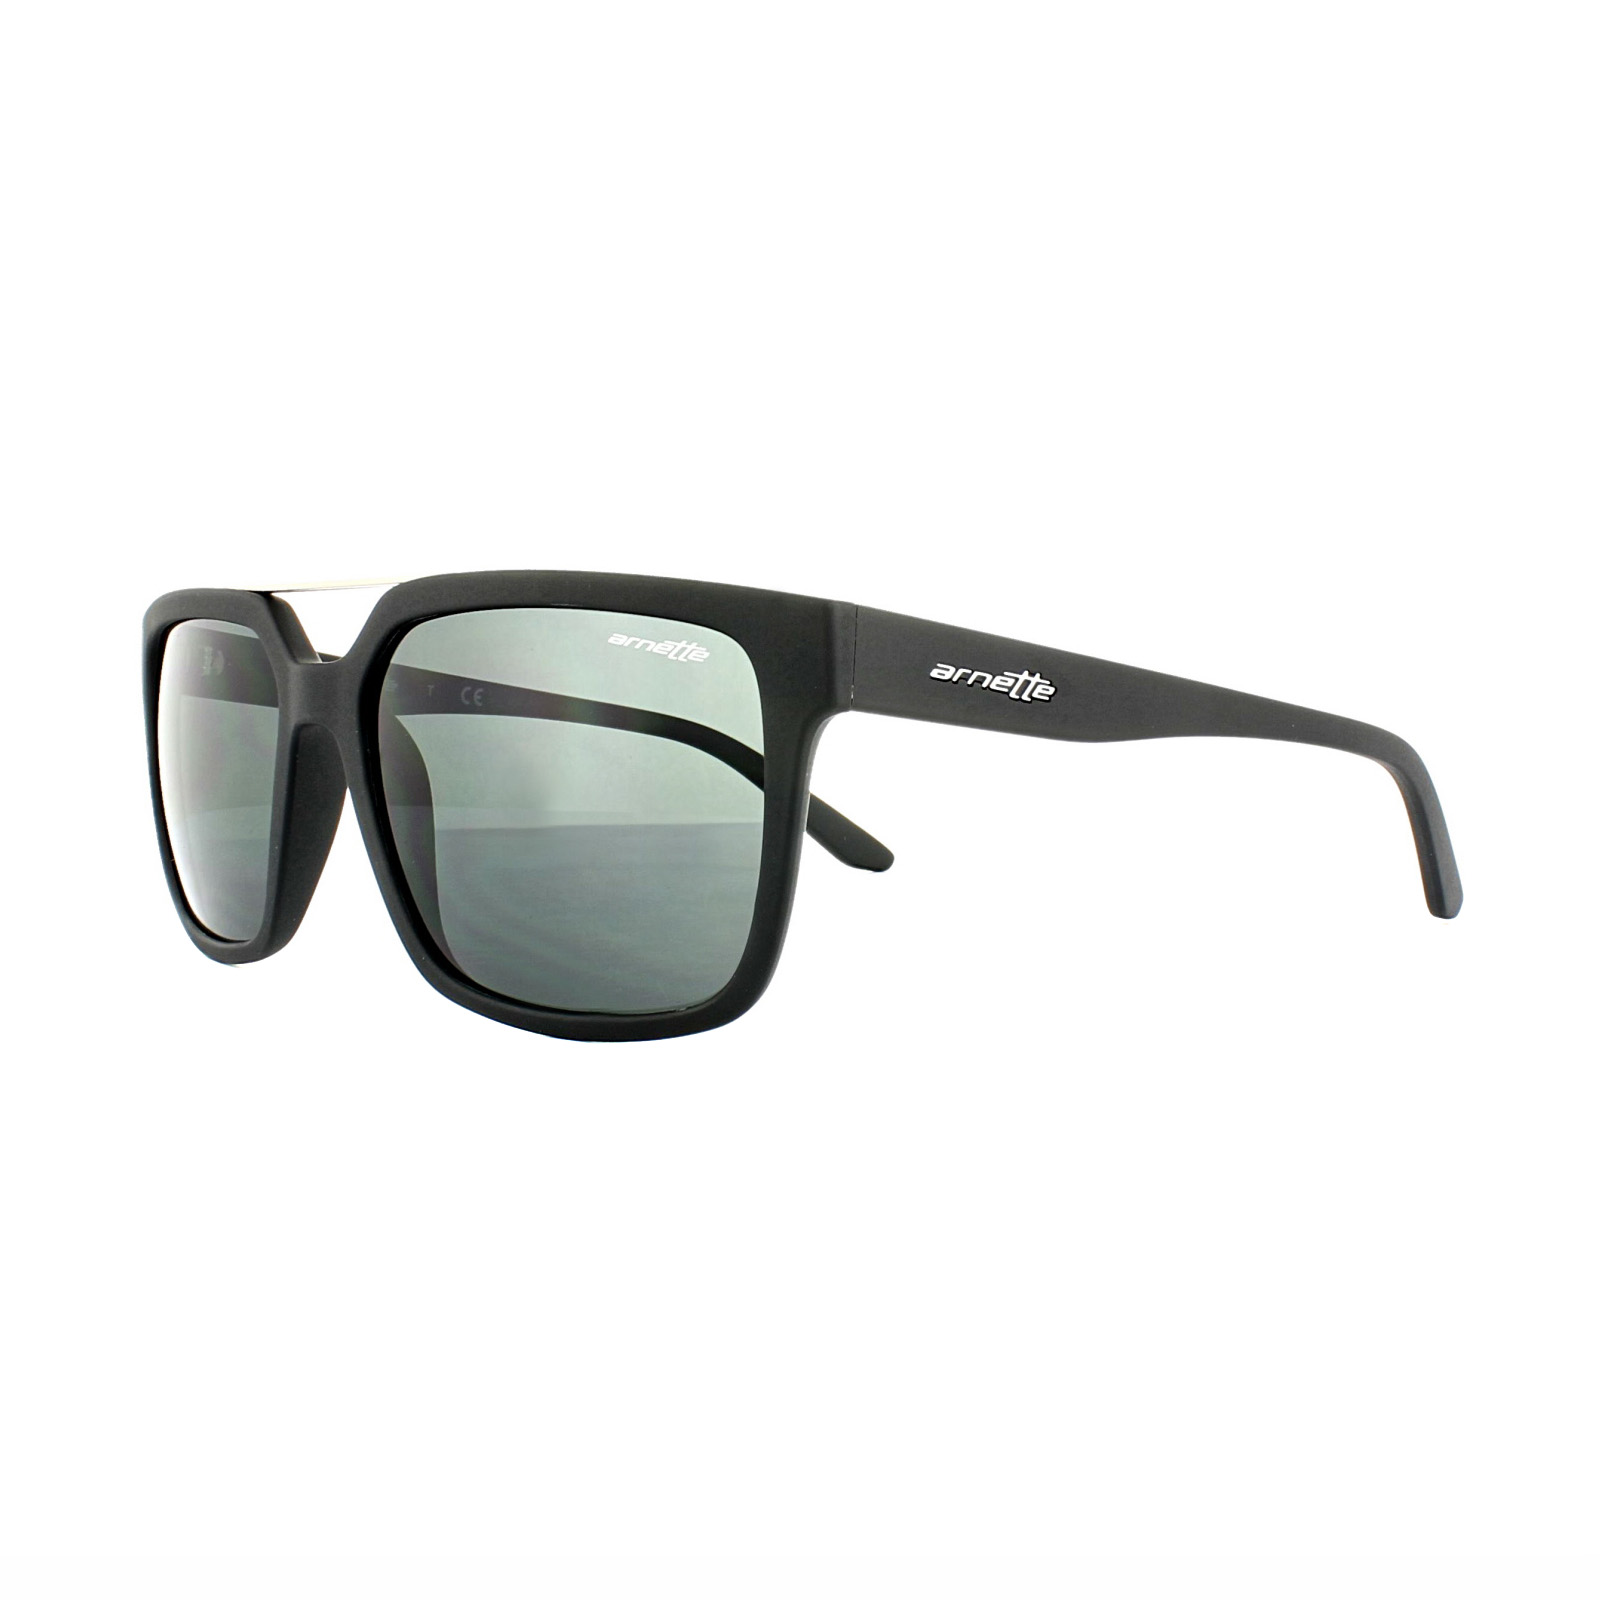 fa9a5a3cbc Sentinel arnette sunglasses petrolhead matt black grey jpg 1600x1600 Arnette  sunglass models